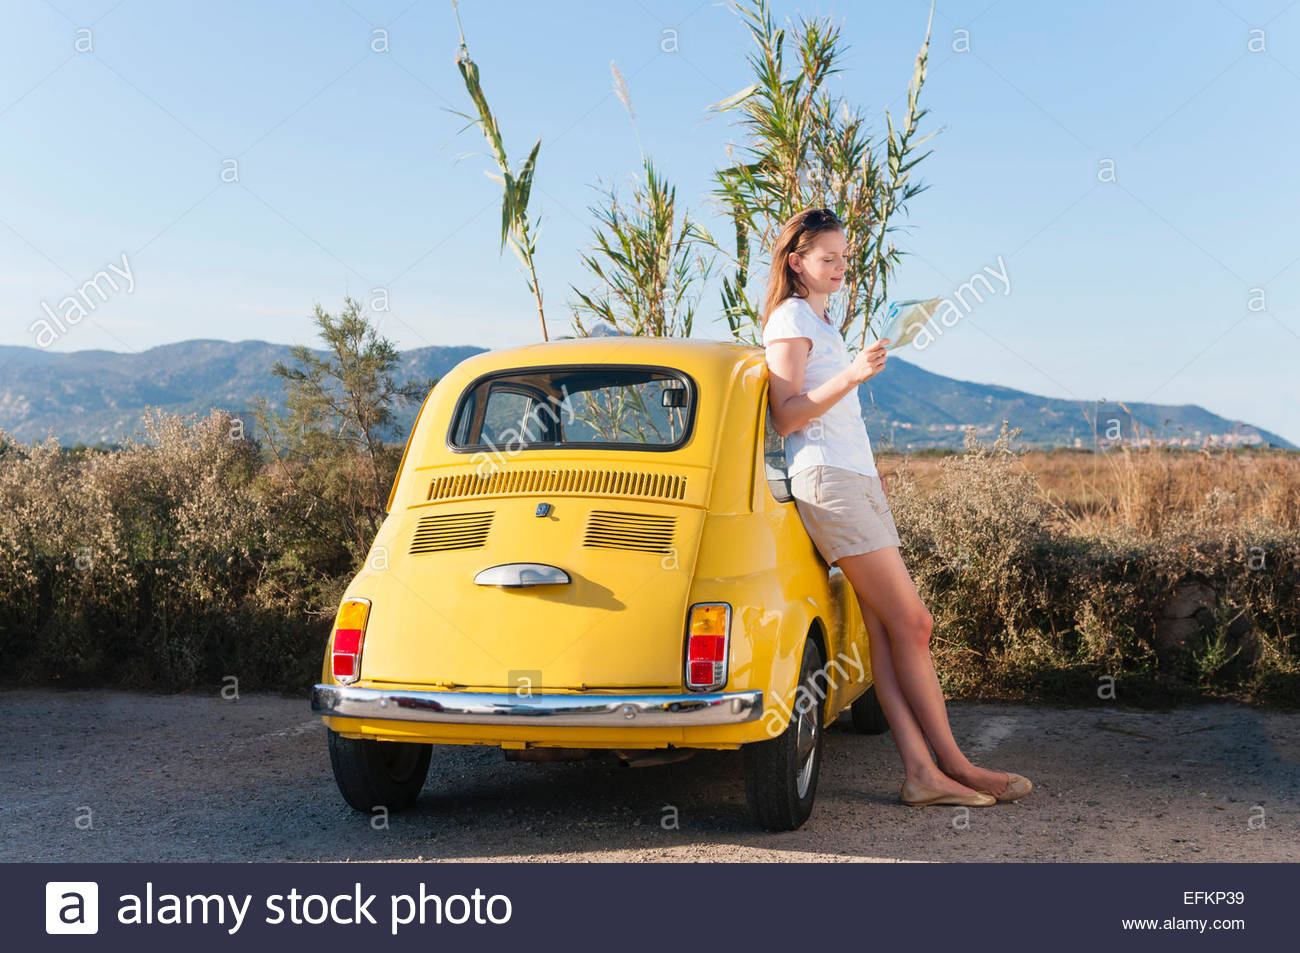 Mid adult woman reading map against yellow retro car, Sardinia, Italy - Stock Image